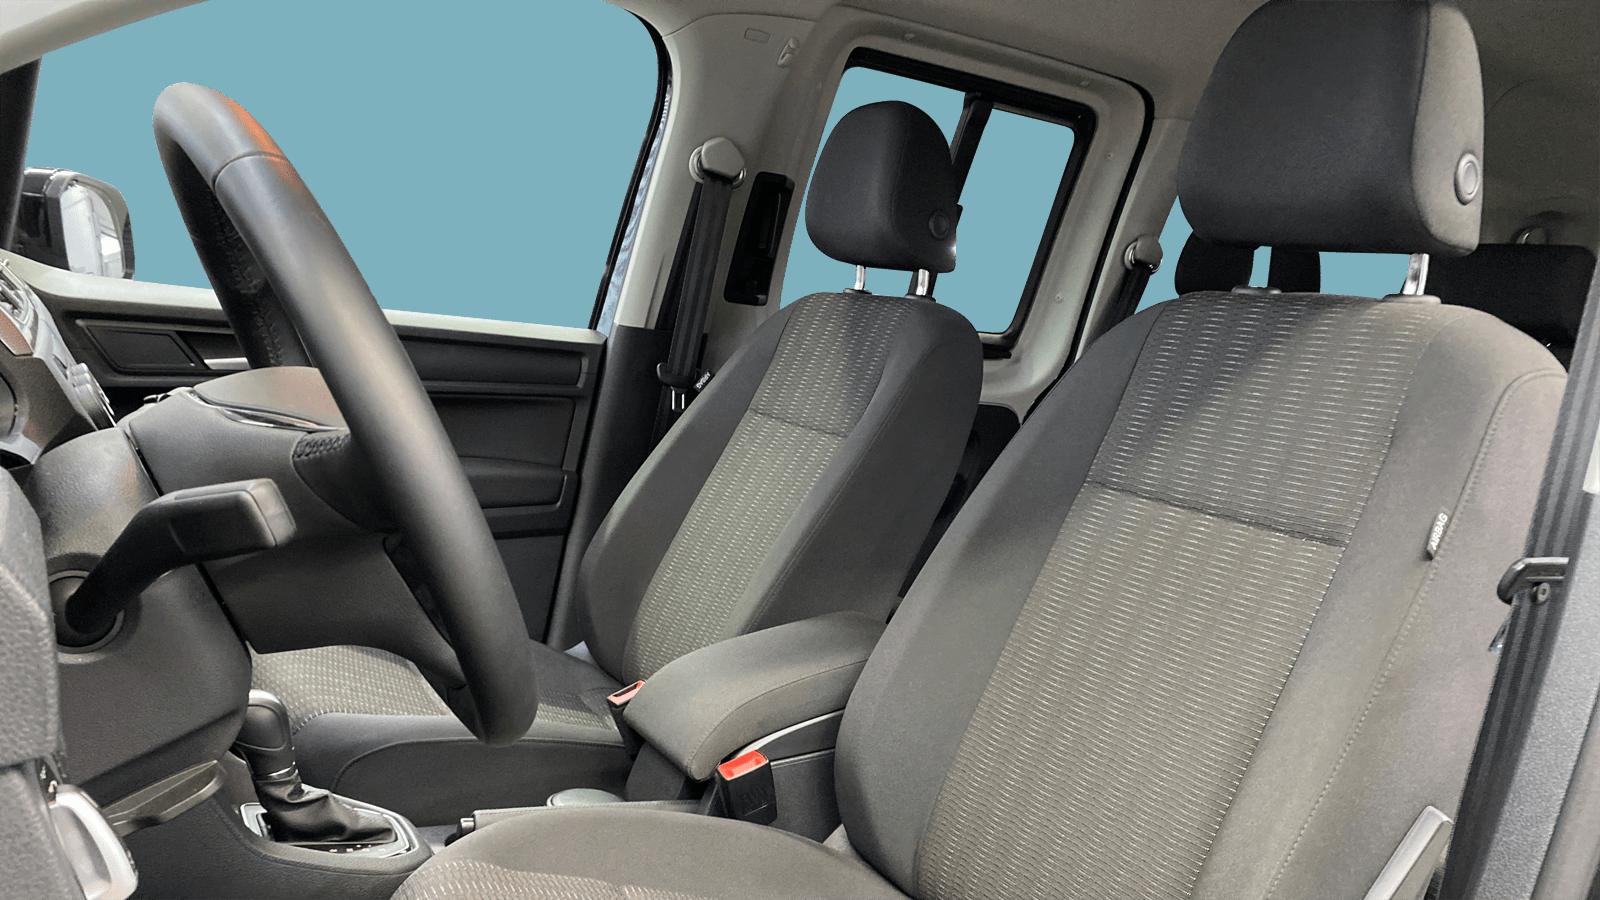 VW Caddy Maxi Black interior - Clyde car subscription